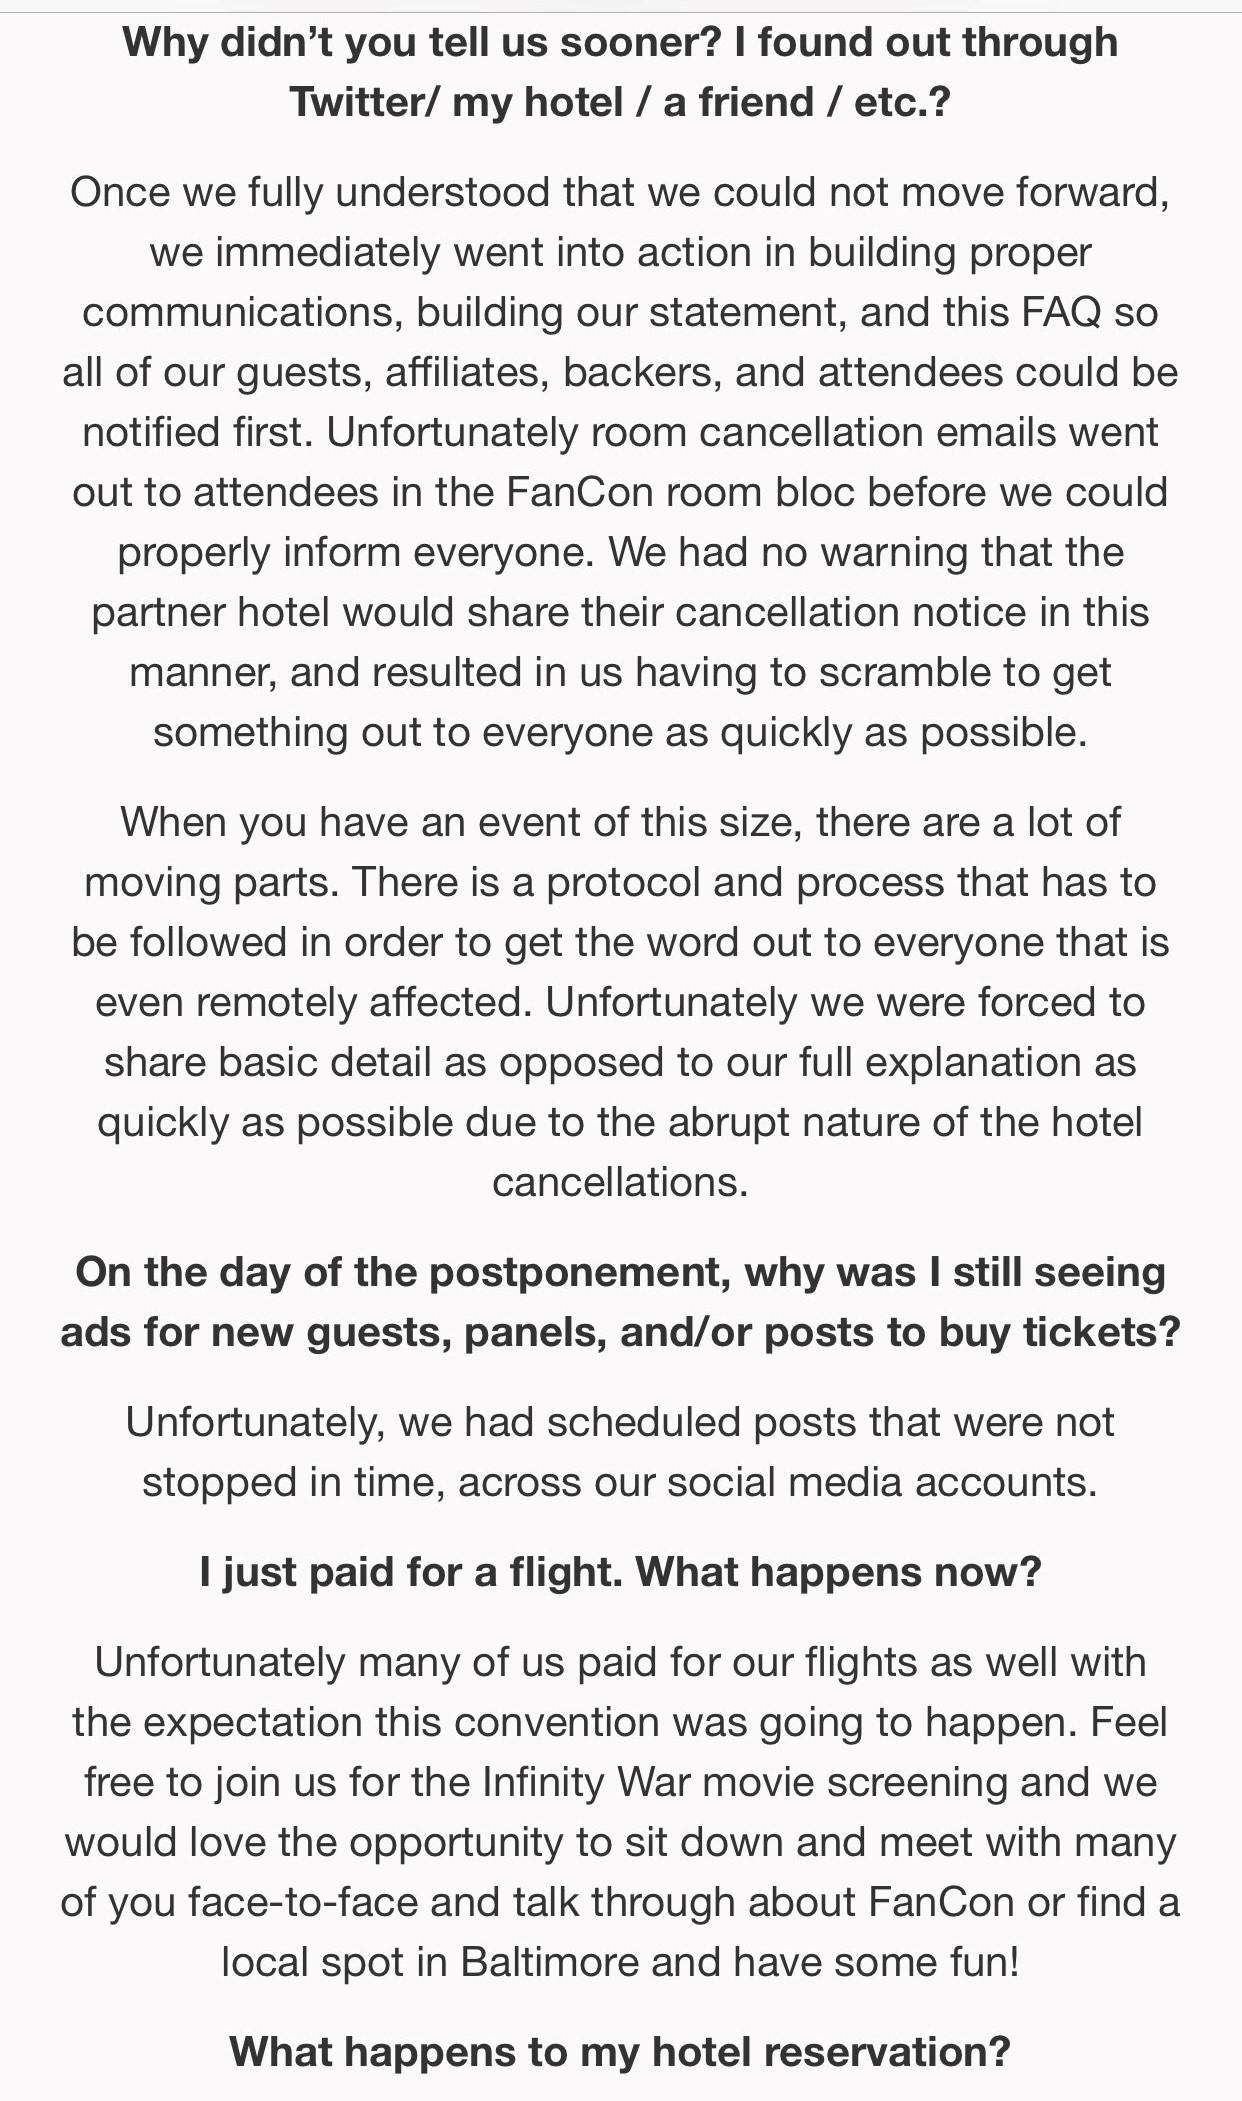 Version Two (Updated Faq On Universal Fan Con's Website):